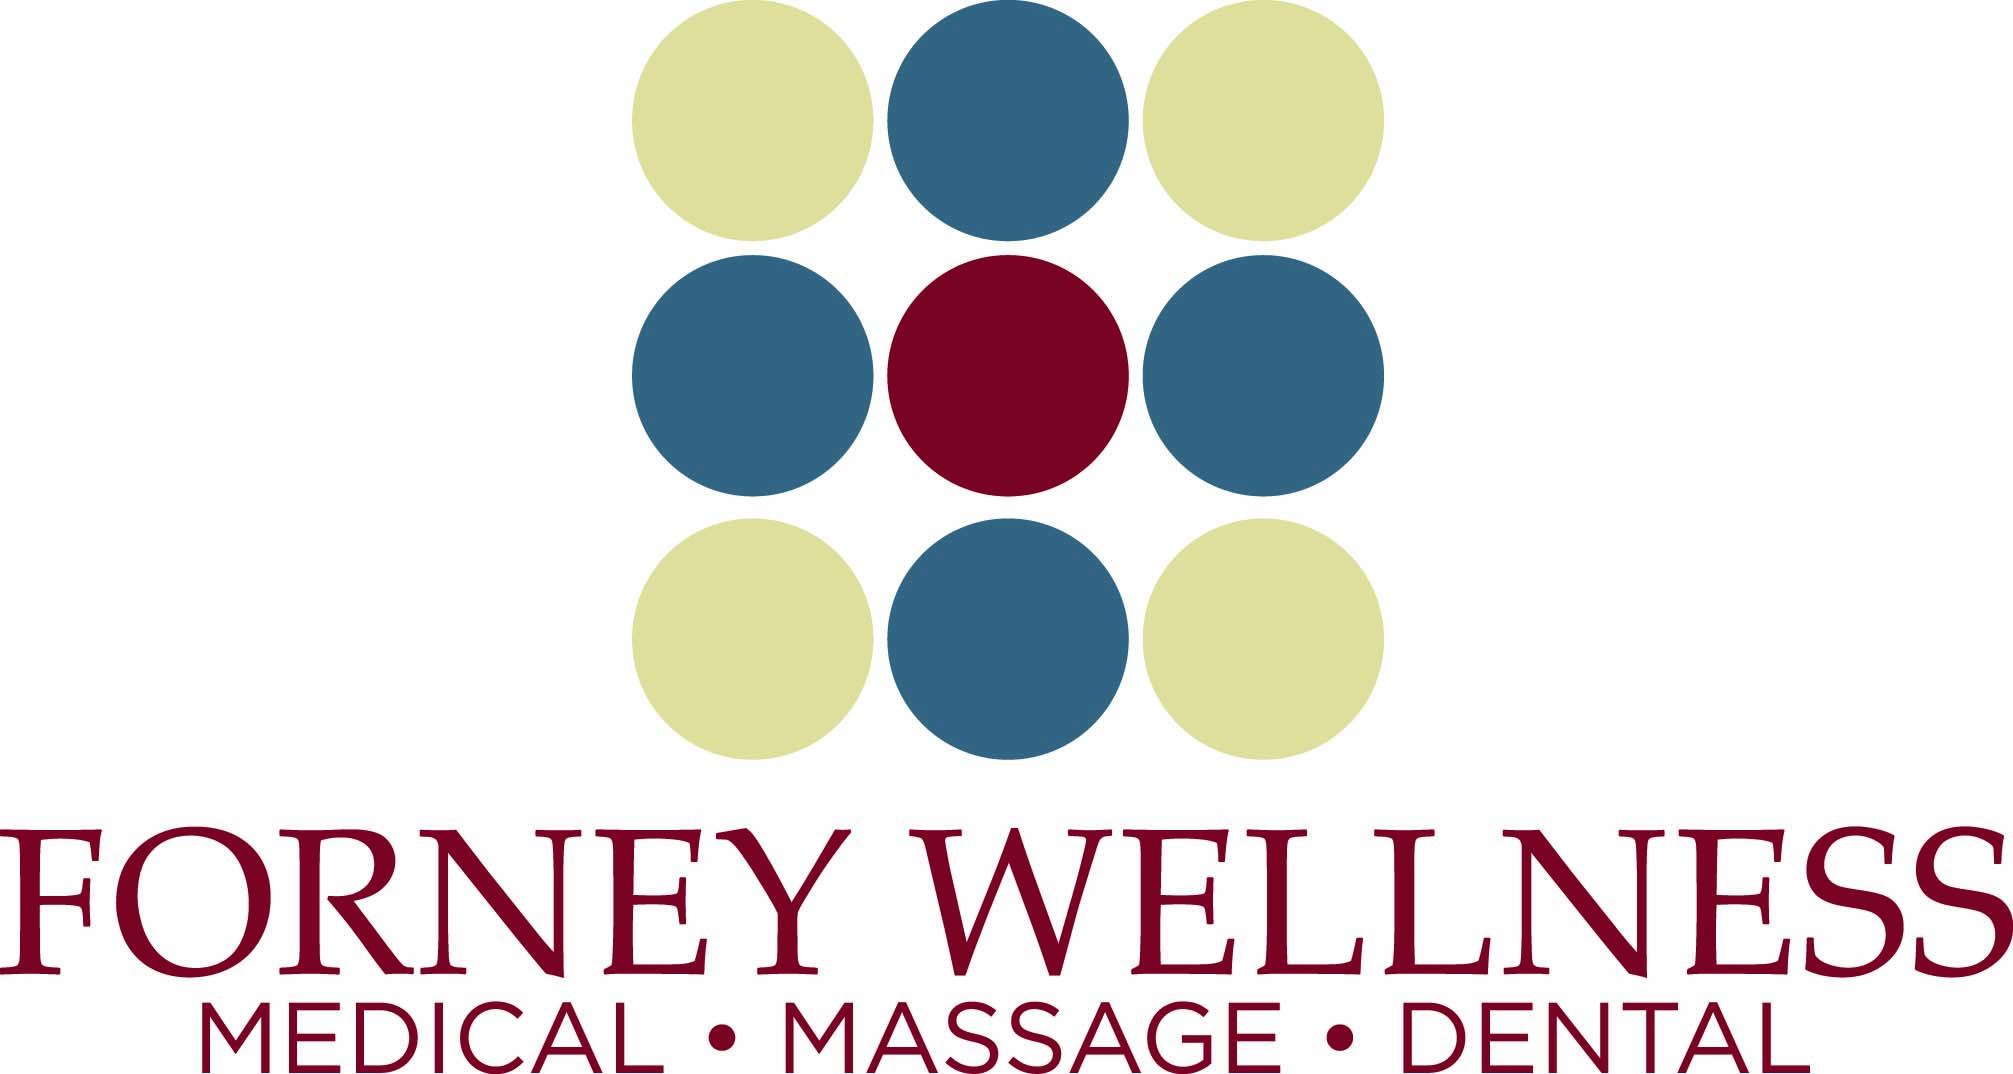 Forney Wellness